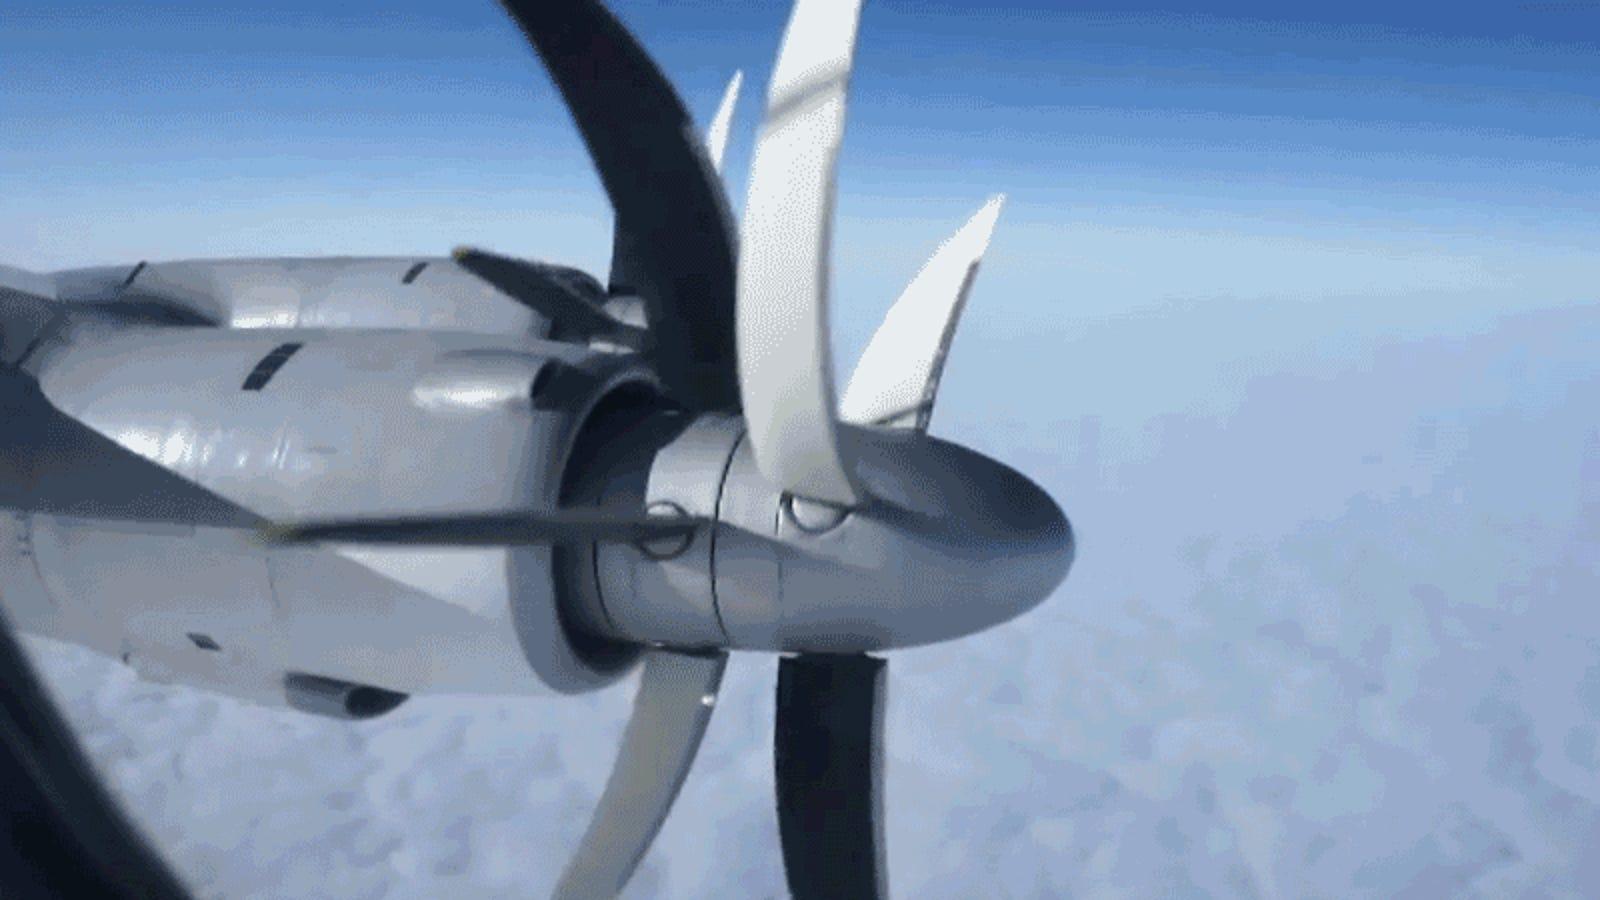 Banging in airplane gif